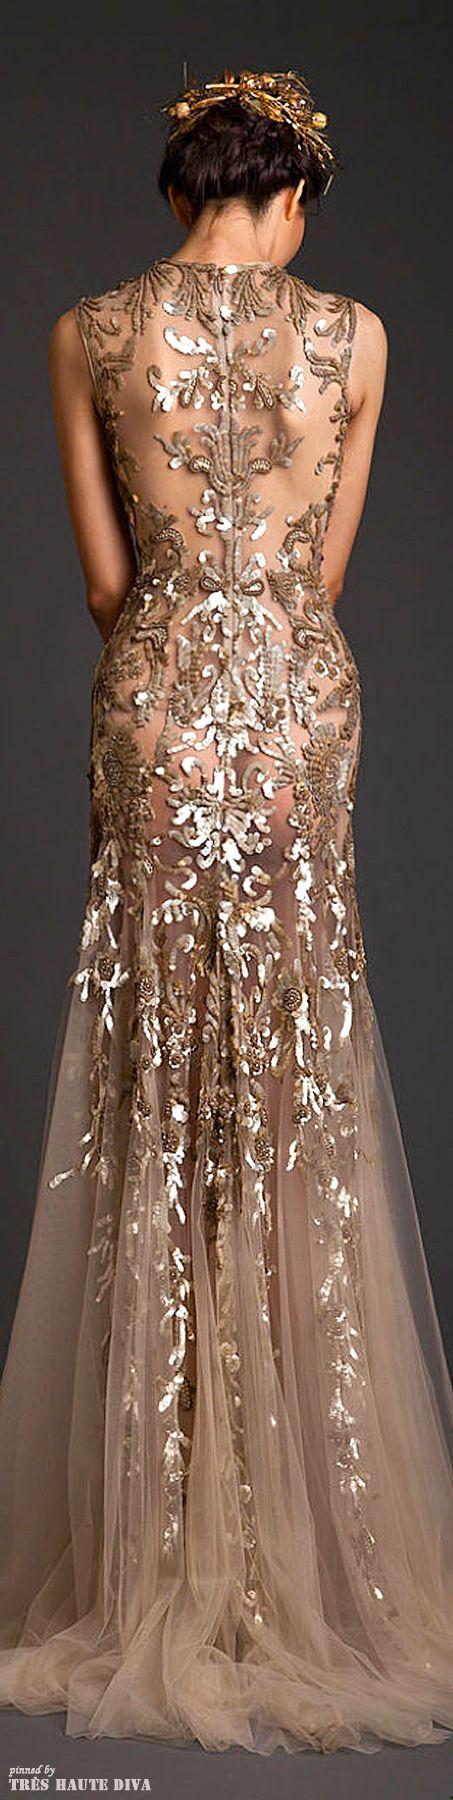 Krikor Jabotian Couture S/S 2014 #baroque